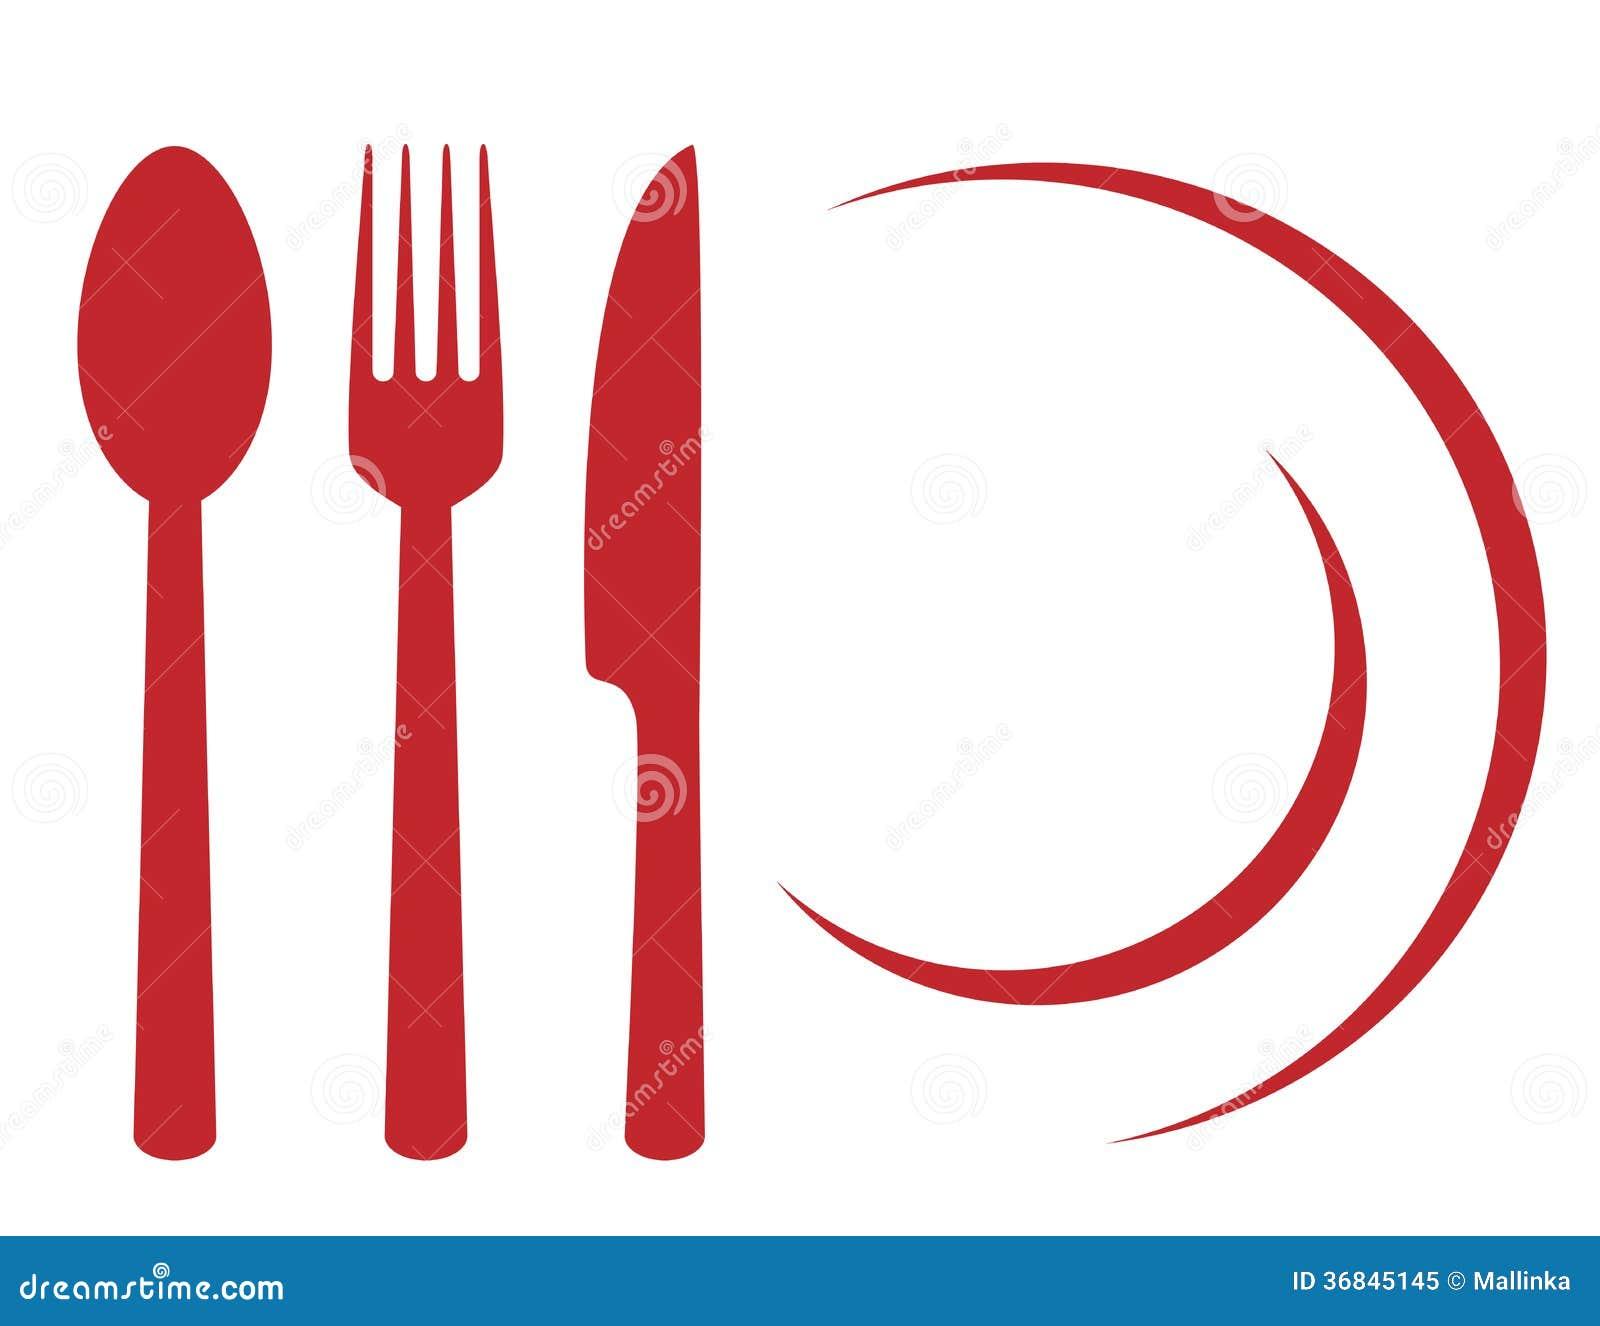 restaurant symbols clip art - photo #8